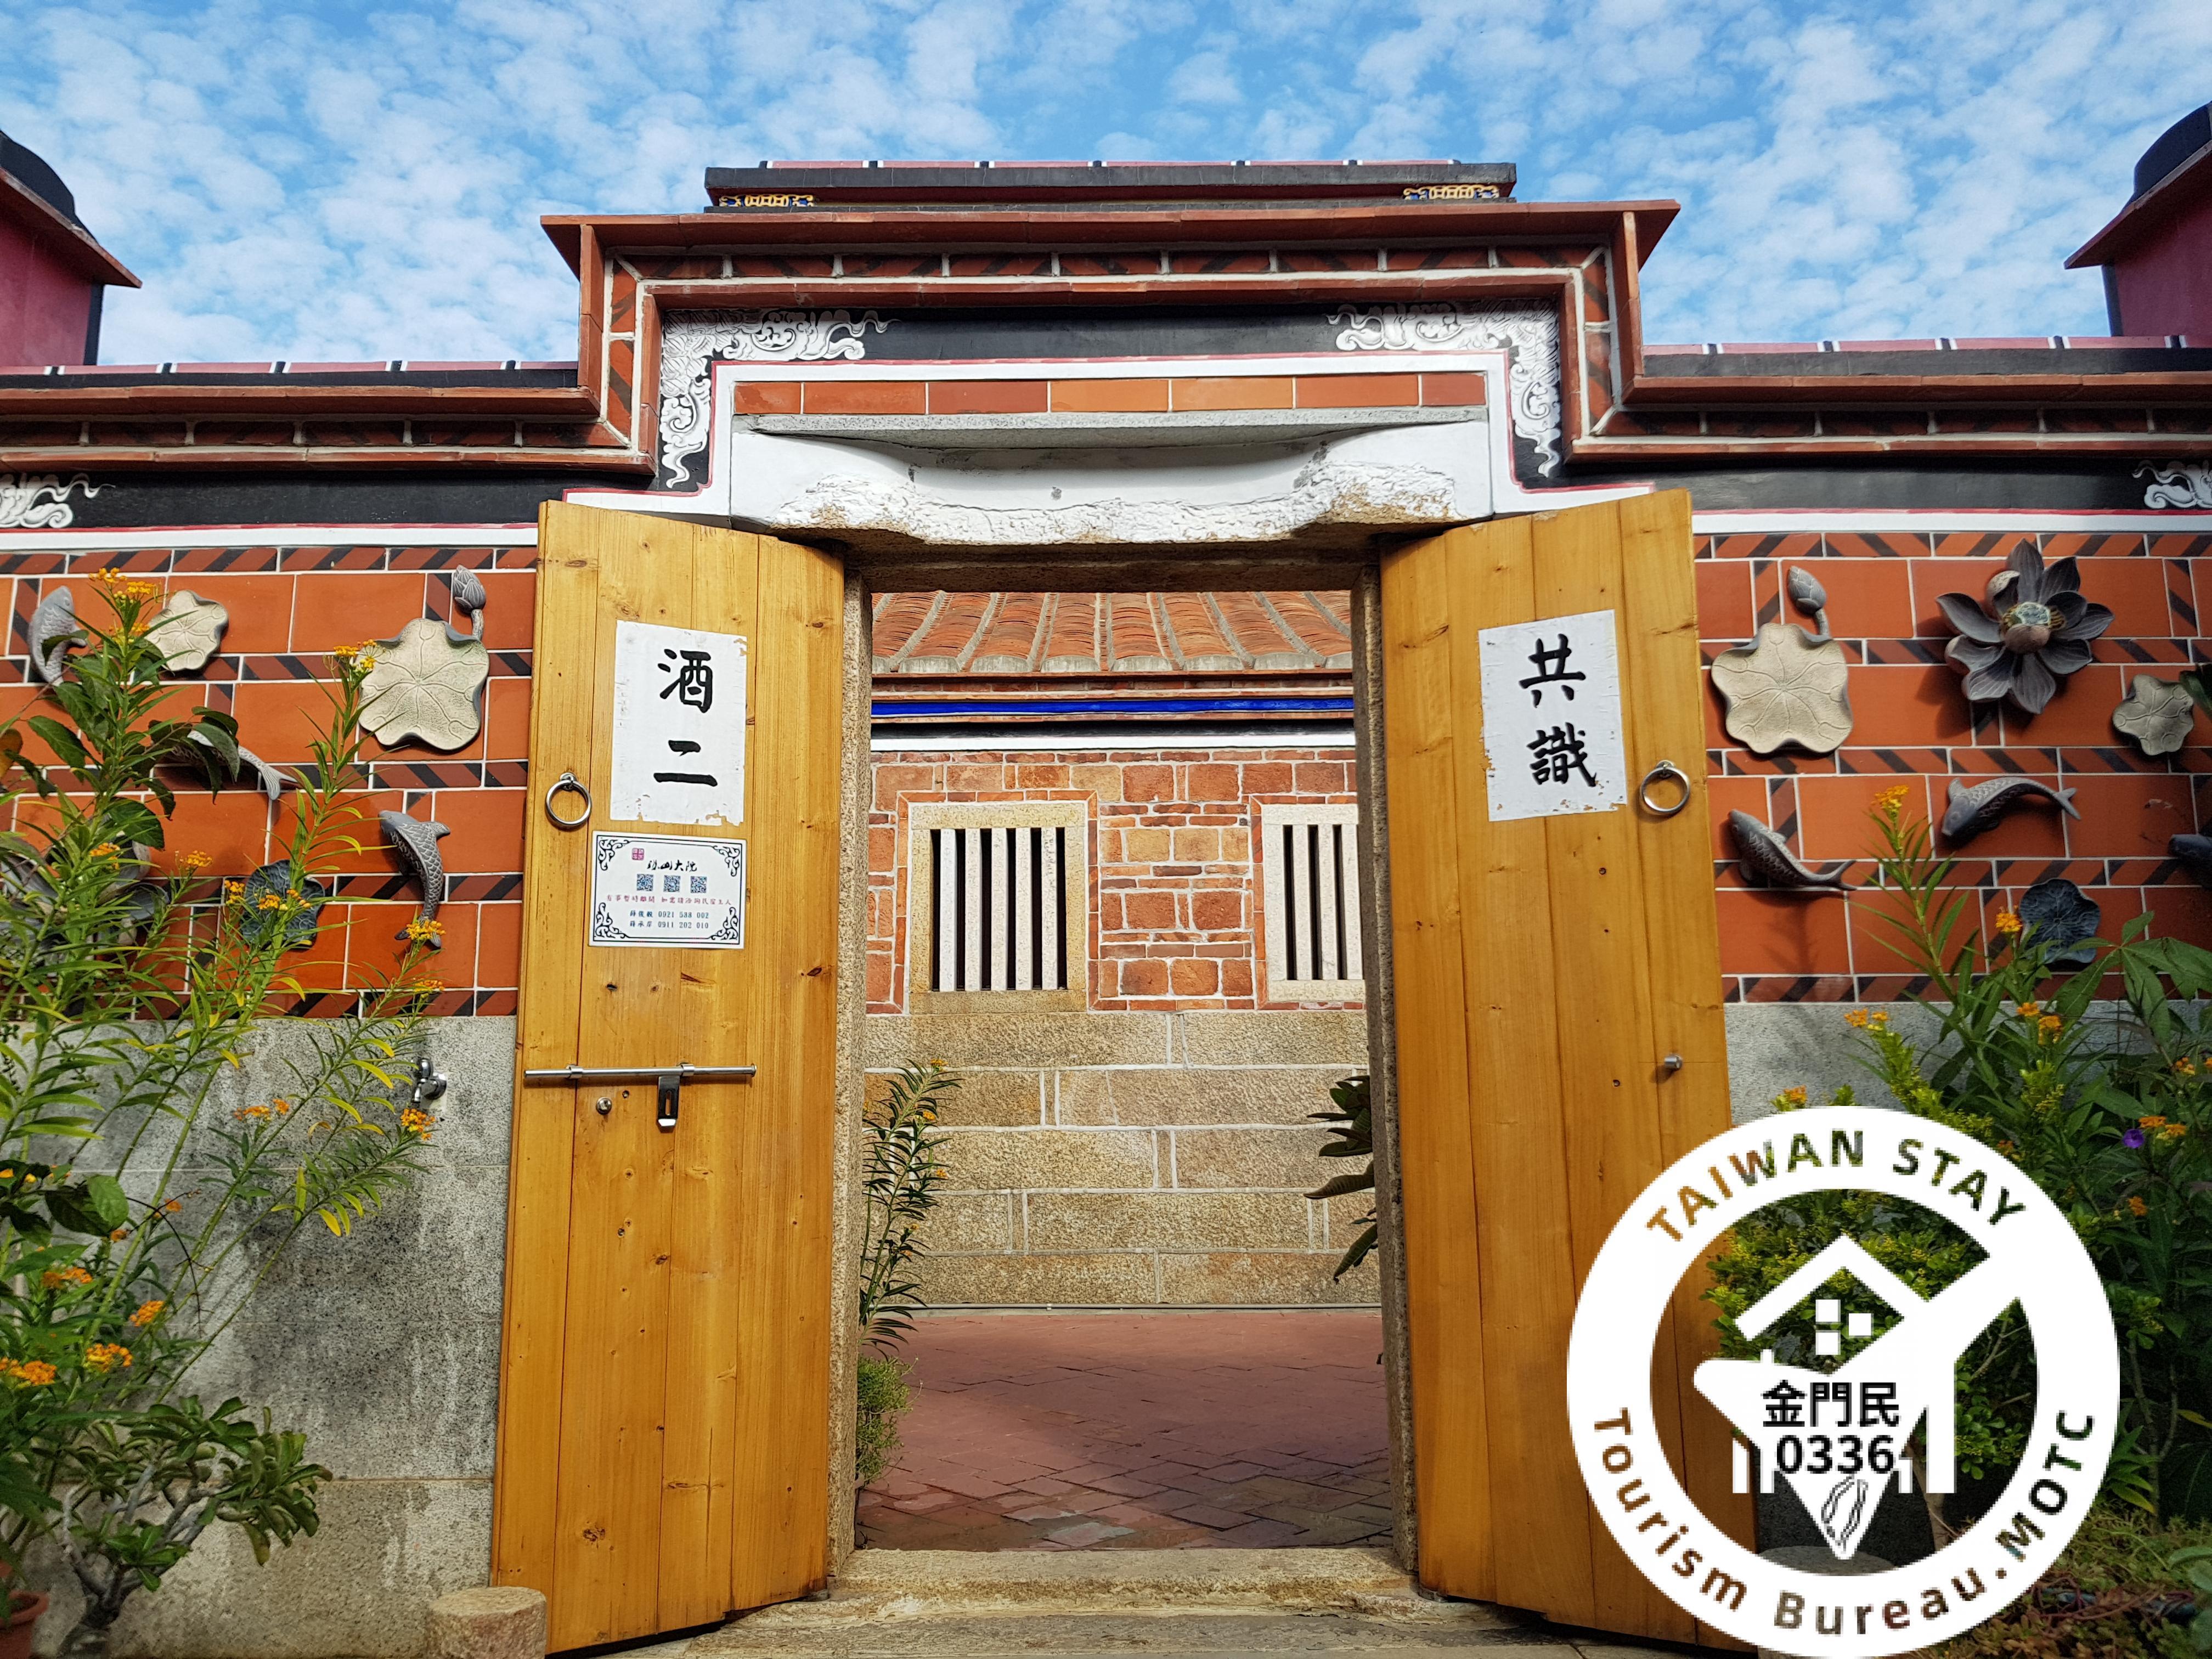 Zhushan compound